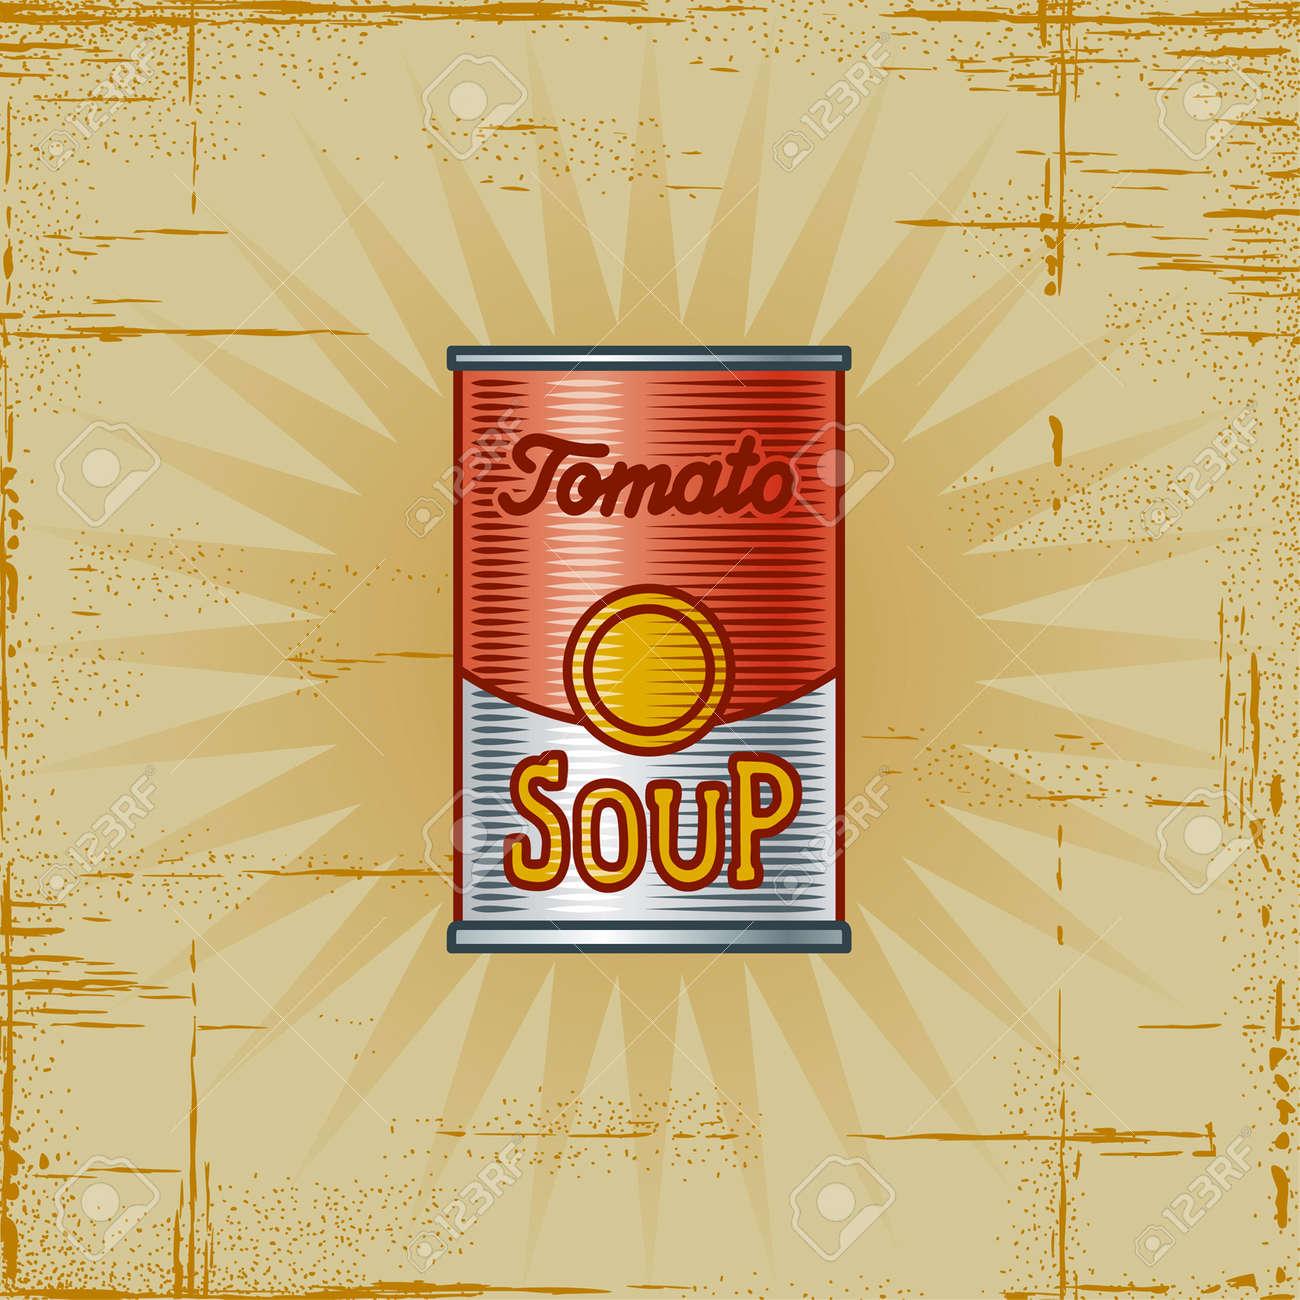 Retro Tomato Soup Can Stock Vector - 6582330